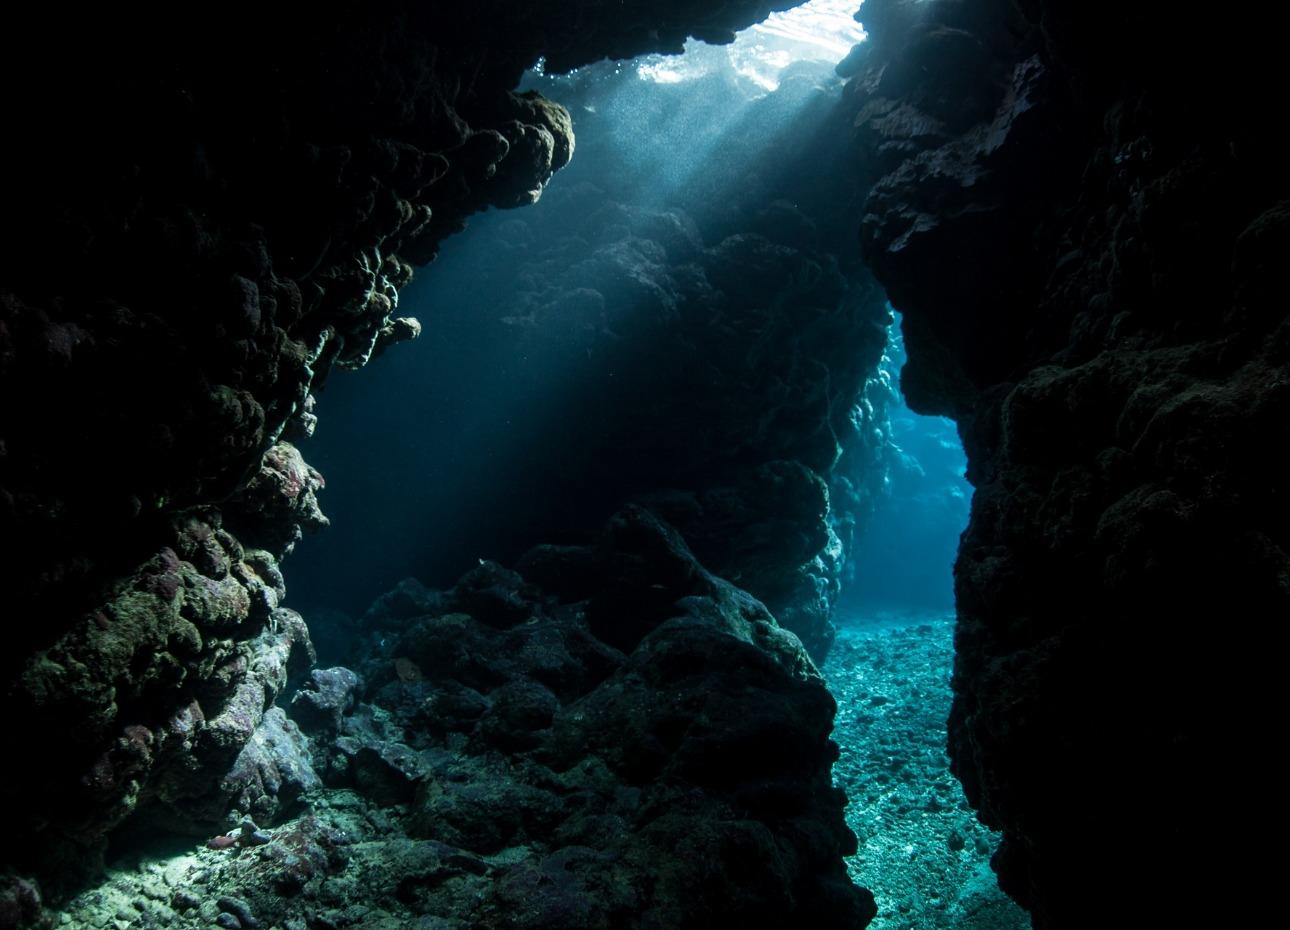 Solomon Islands, Deep Cave, image